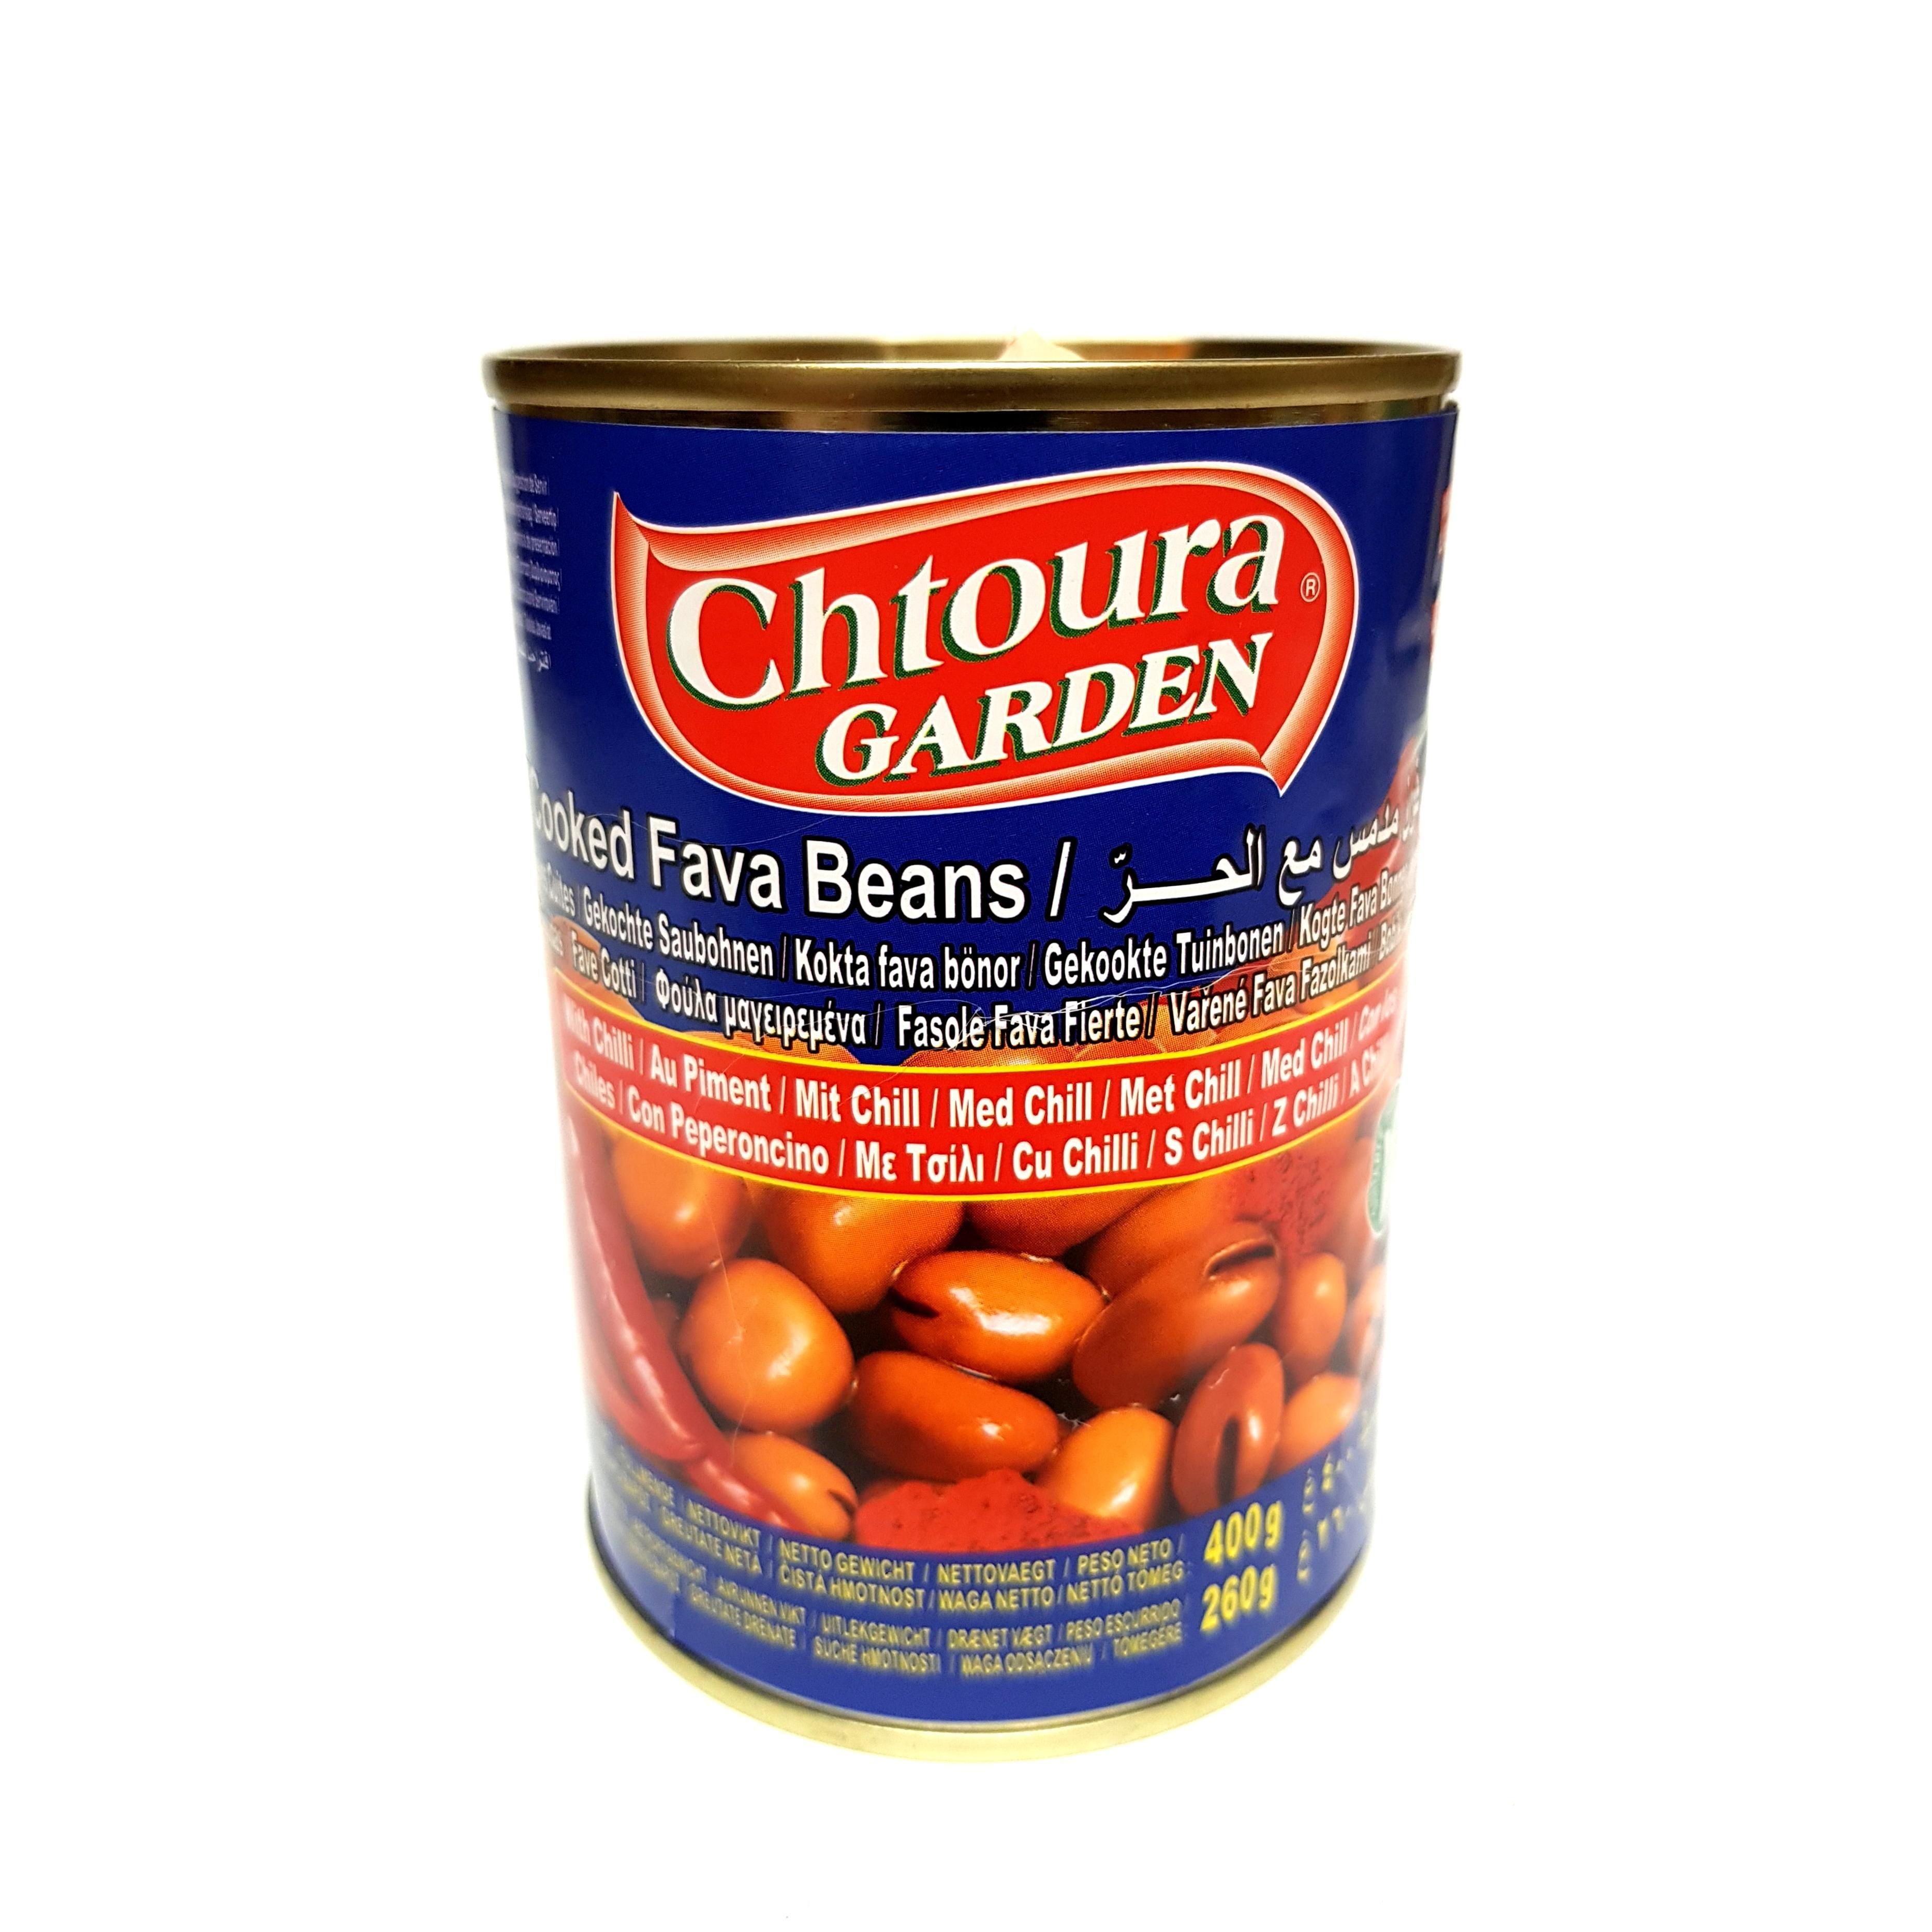 Chtoura Saubohnen Bohnen mit Chili Foul Medammas with Chilli 400g